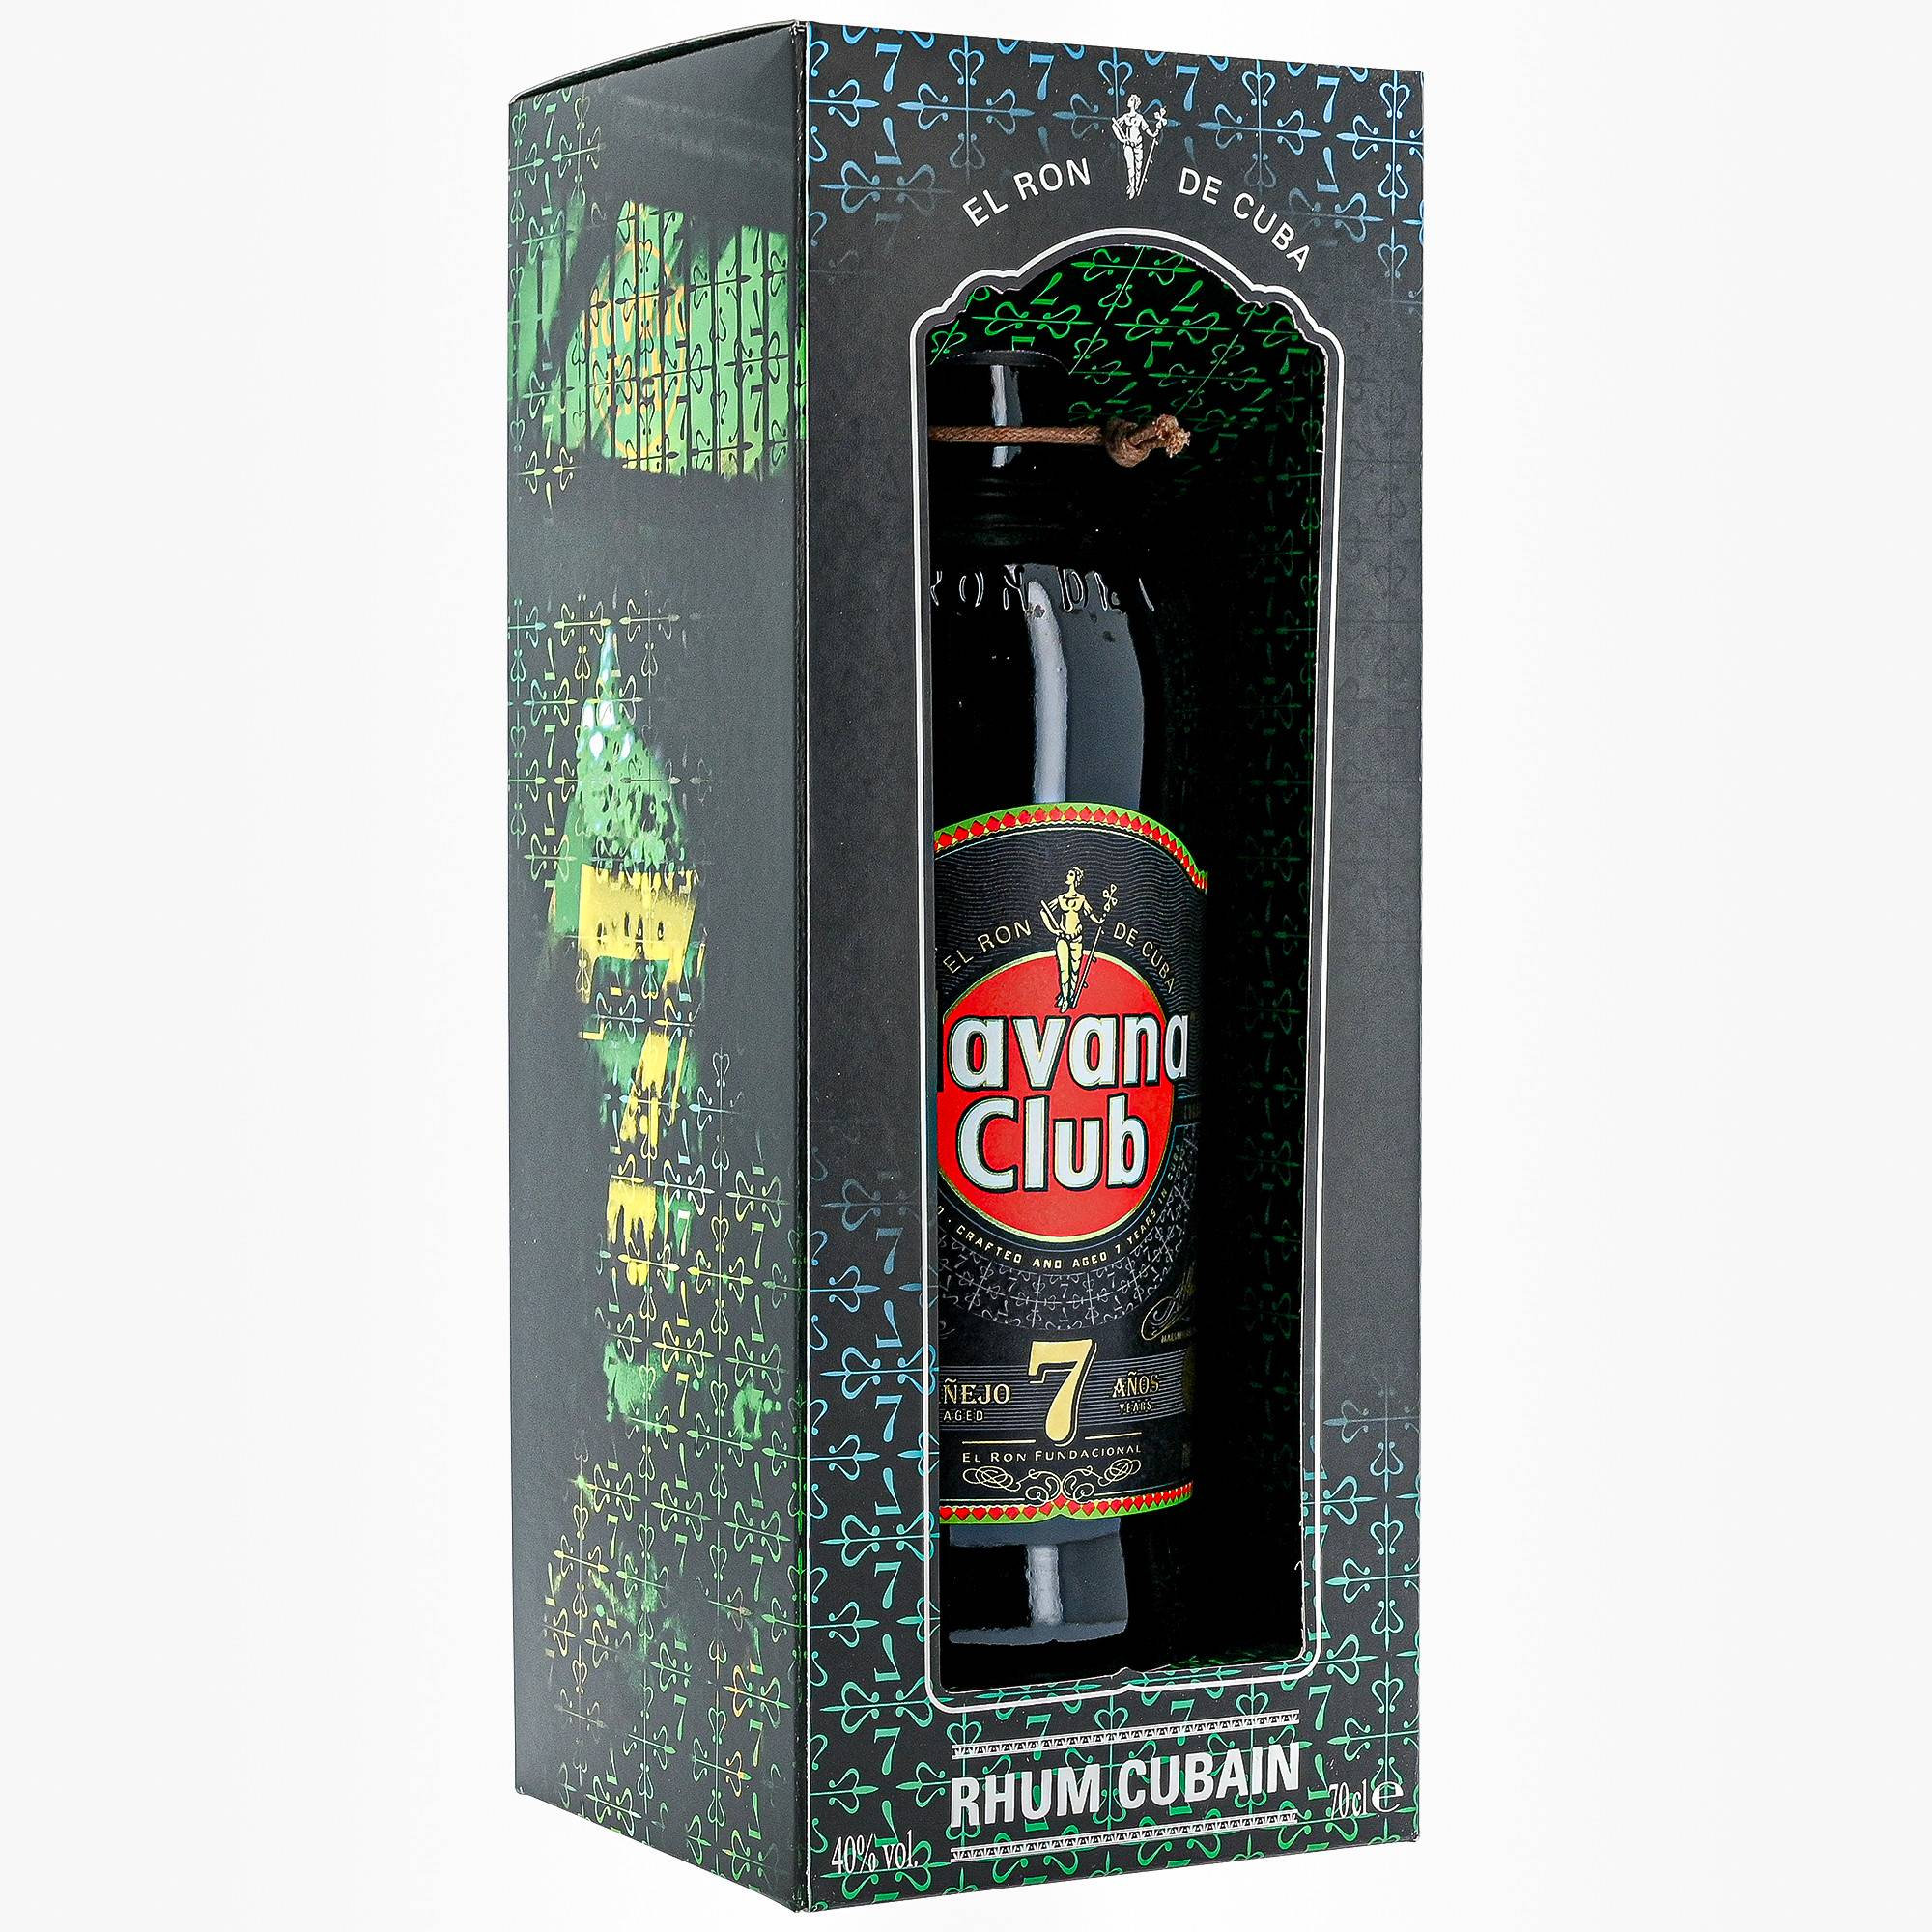 Enseigne Leclerc Luxe Havana Club Of 24 Inspirant Enseigne Leclerc